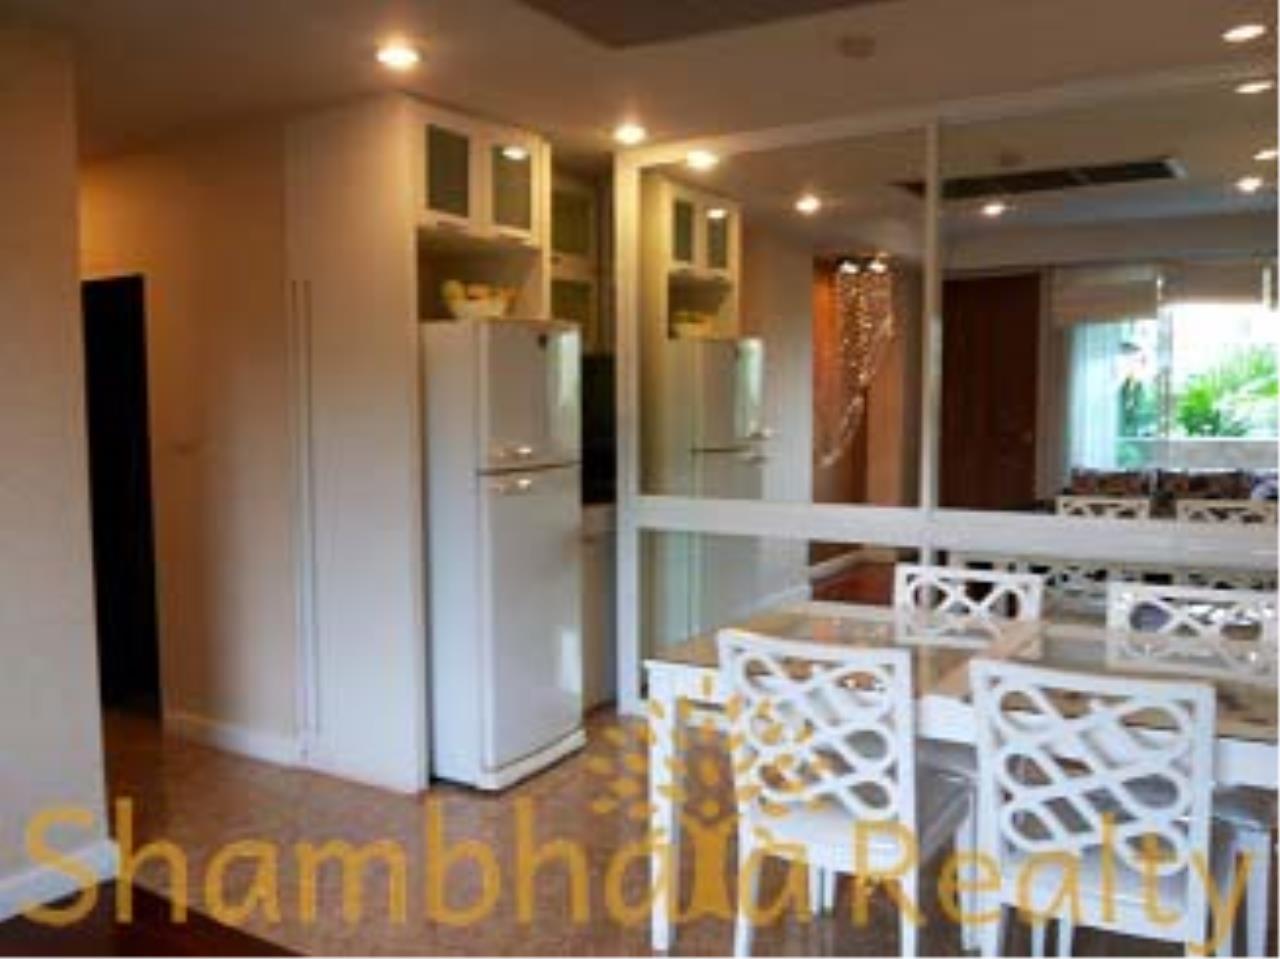 Shambhala Realty Agency's Baan Thanon Sarasin Condominium for Rent in Ratchdamri 7